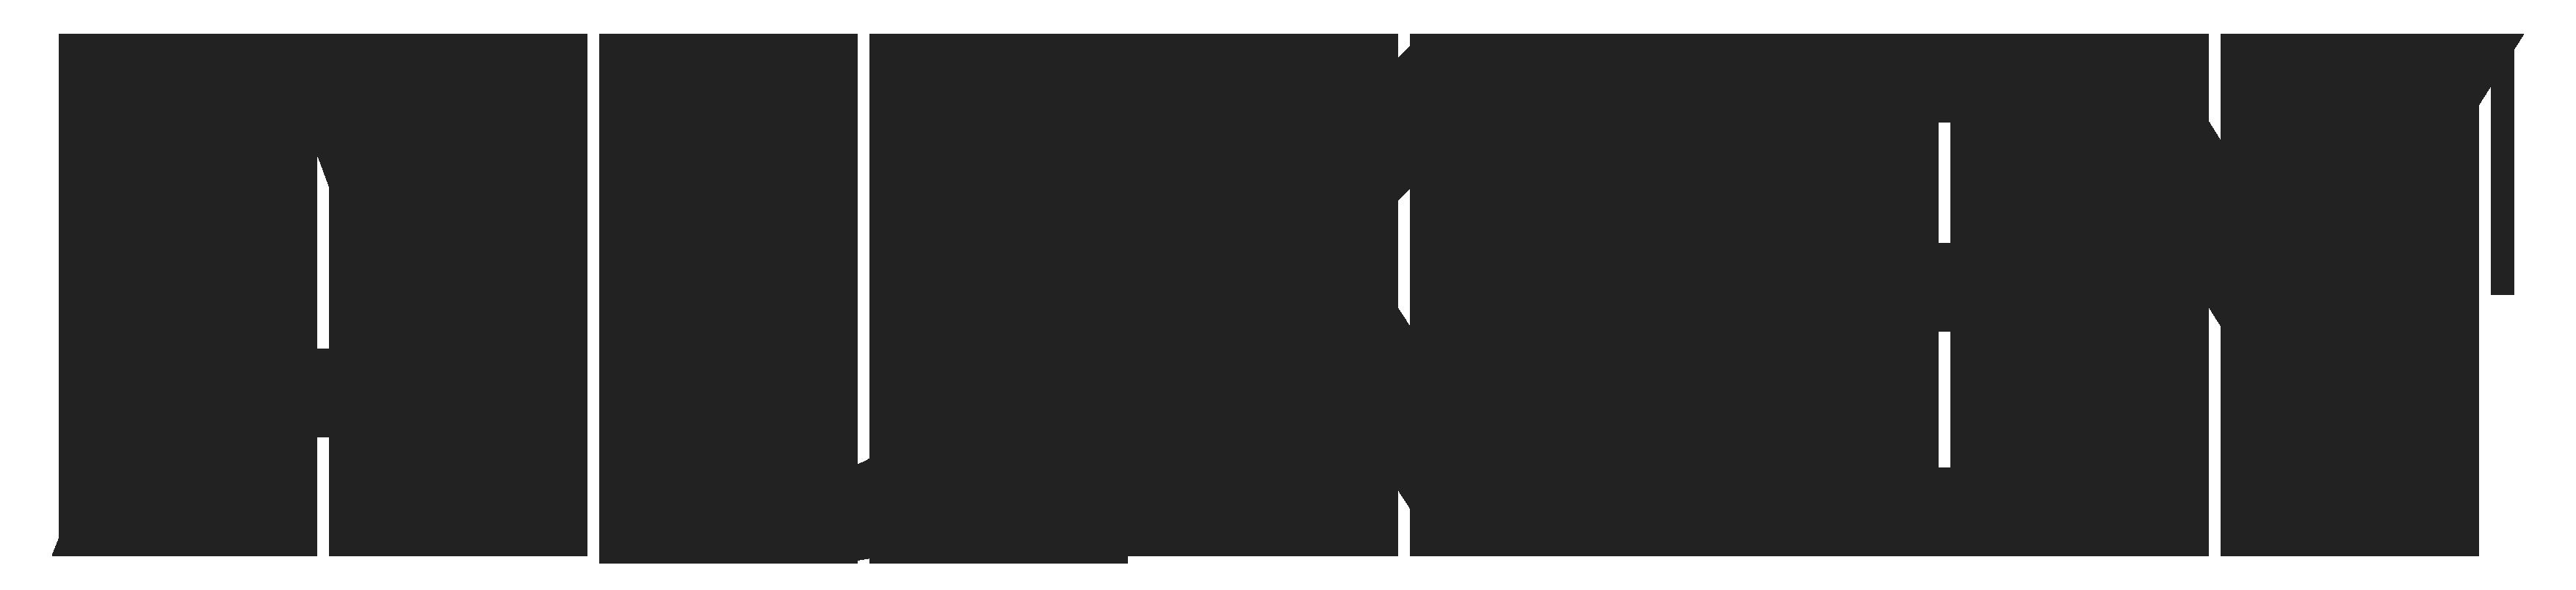 File:AUKEY Brand Logo.png - Wikimedia Commons